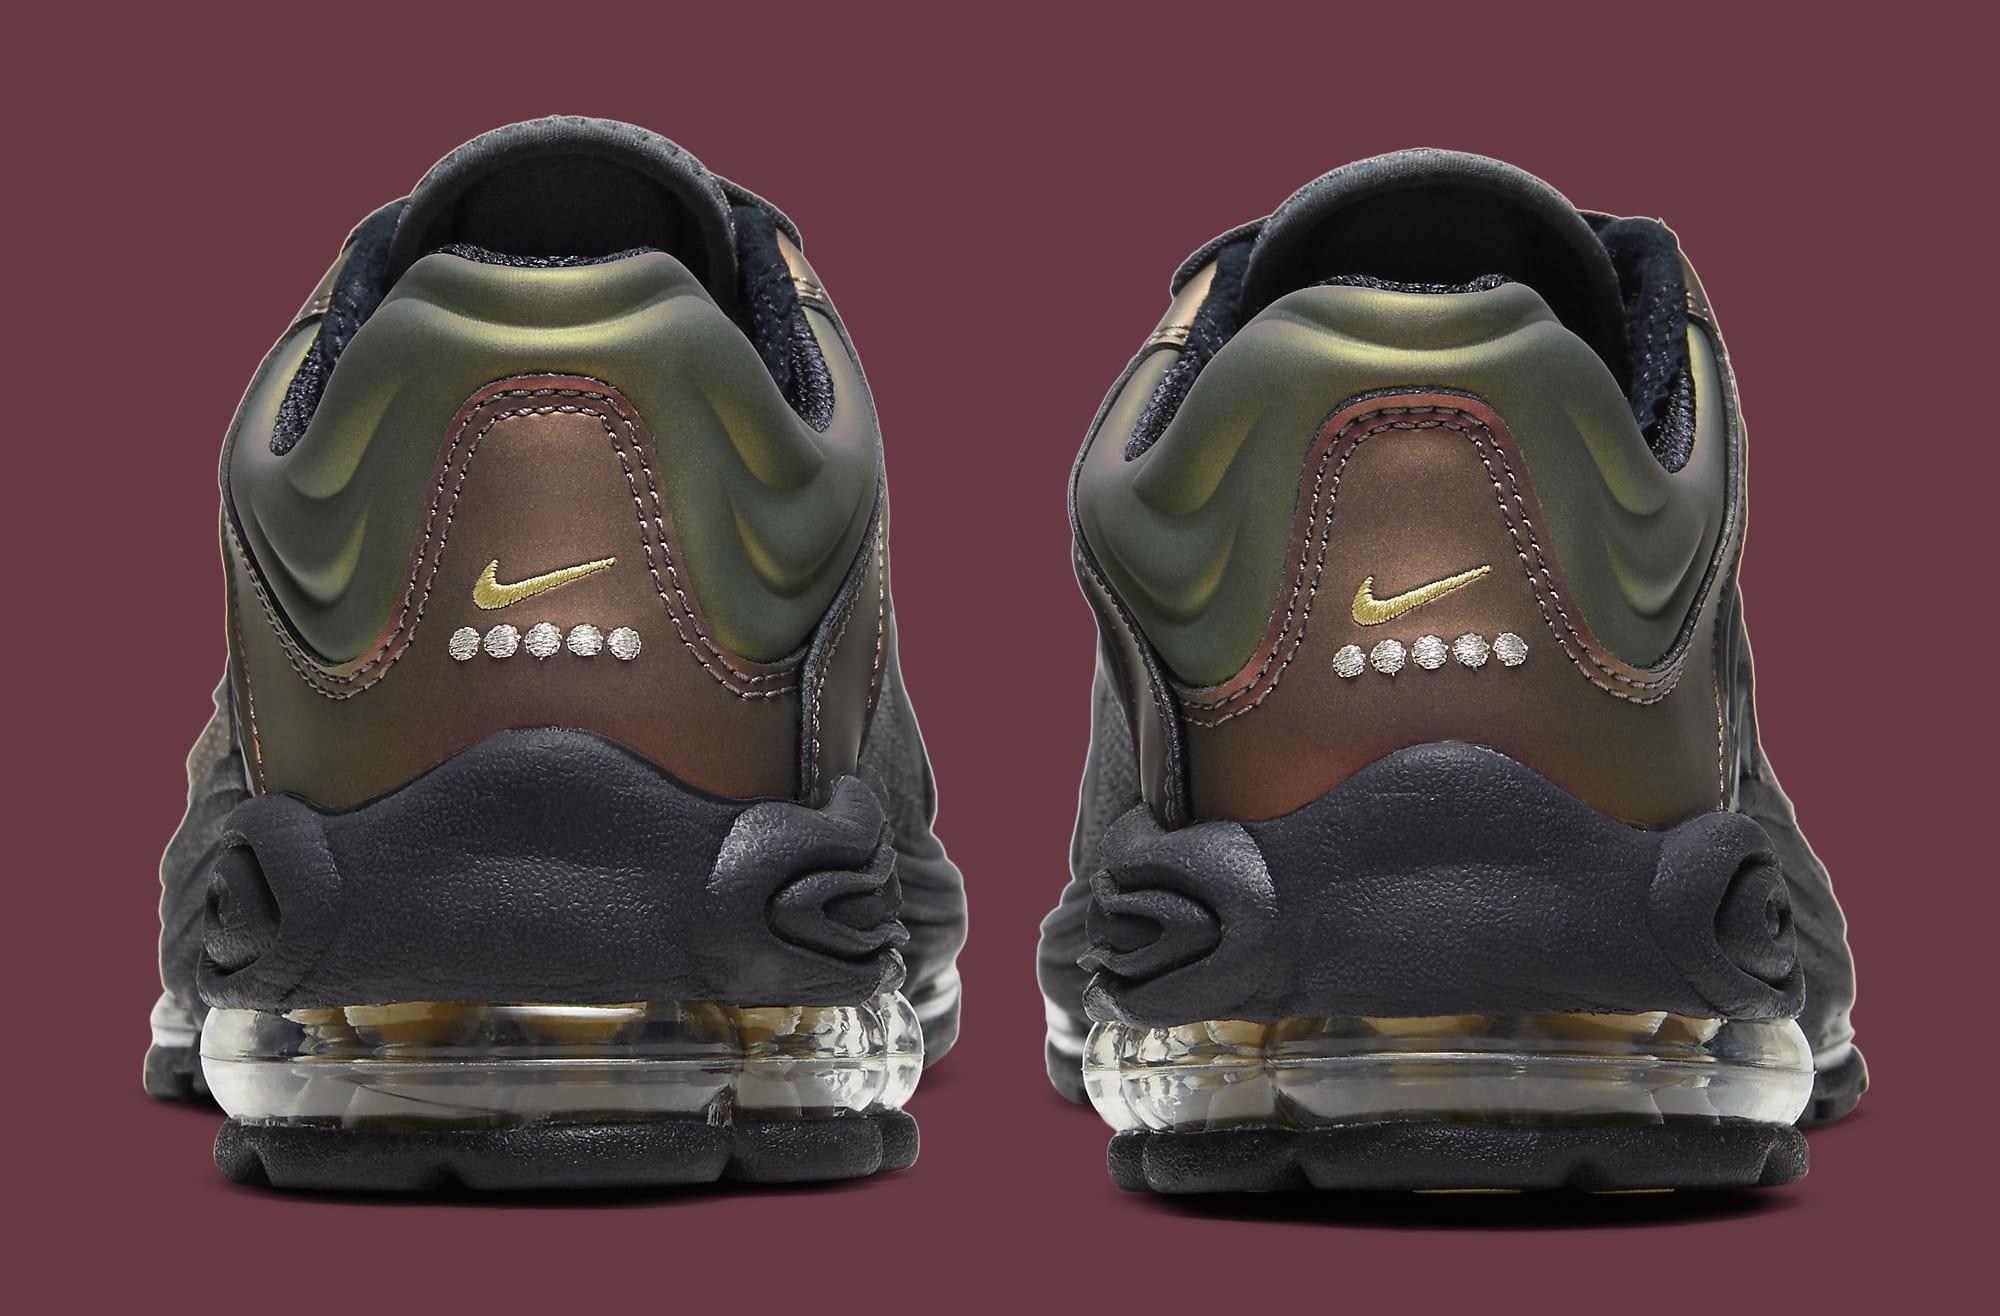 Nike Air Tuned Max Black/Celery/Dark Charcoal CV6984-001 Heel